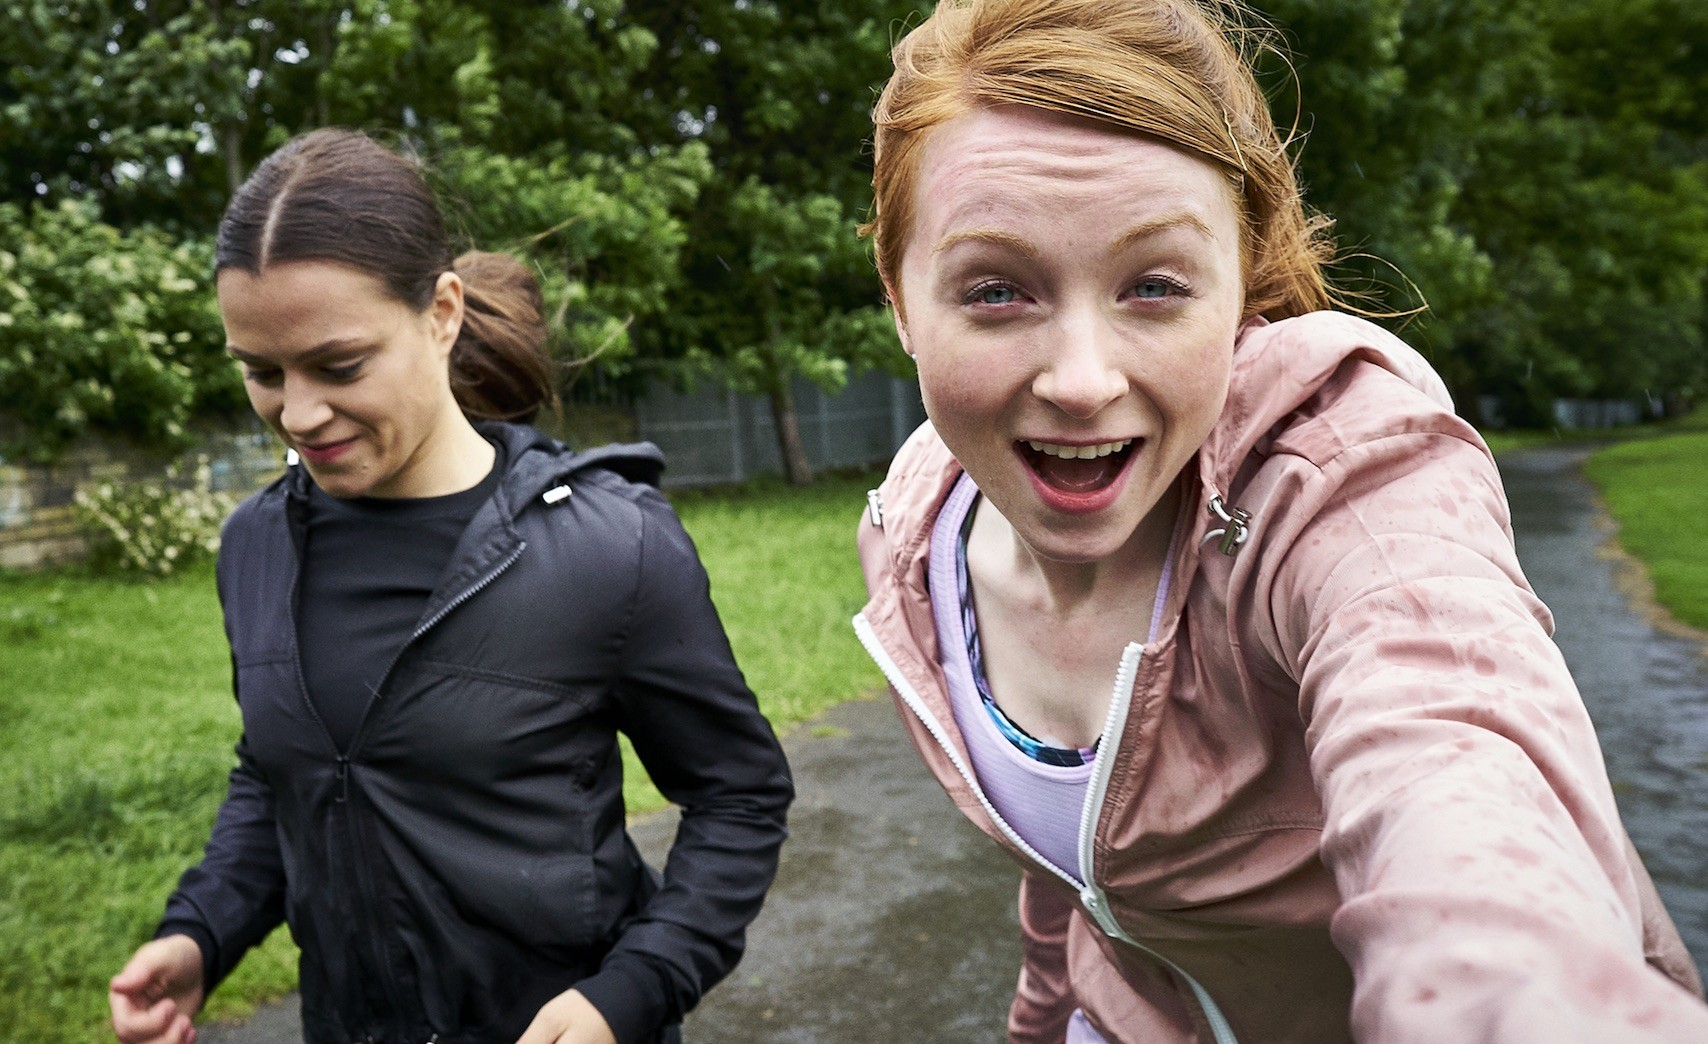 Overshadowed running pic